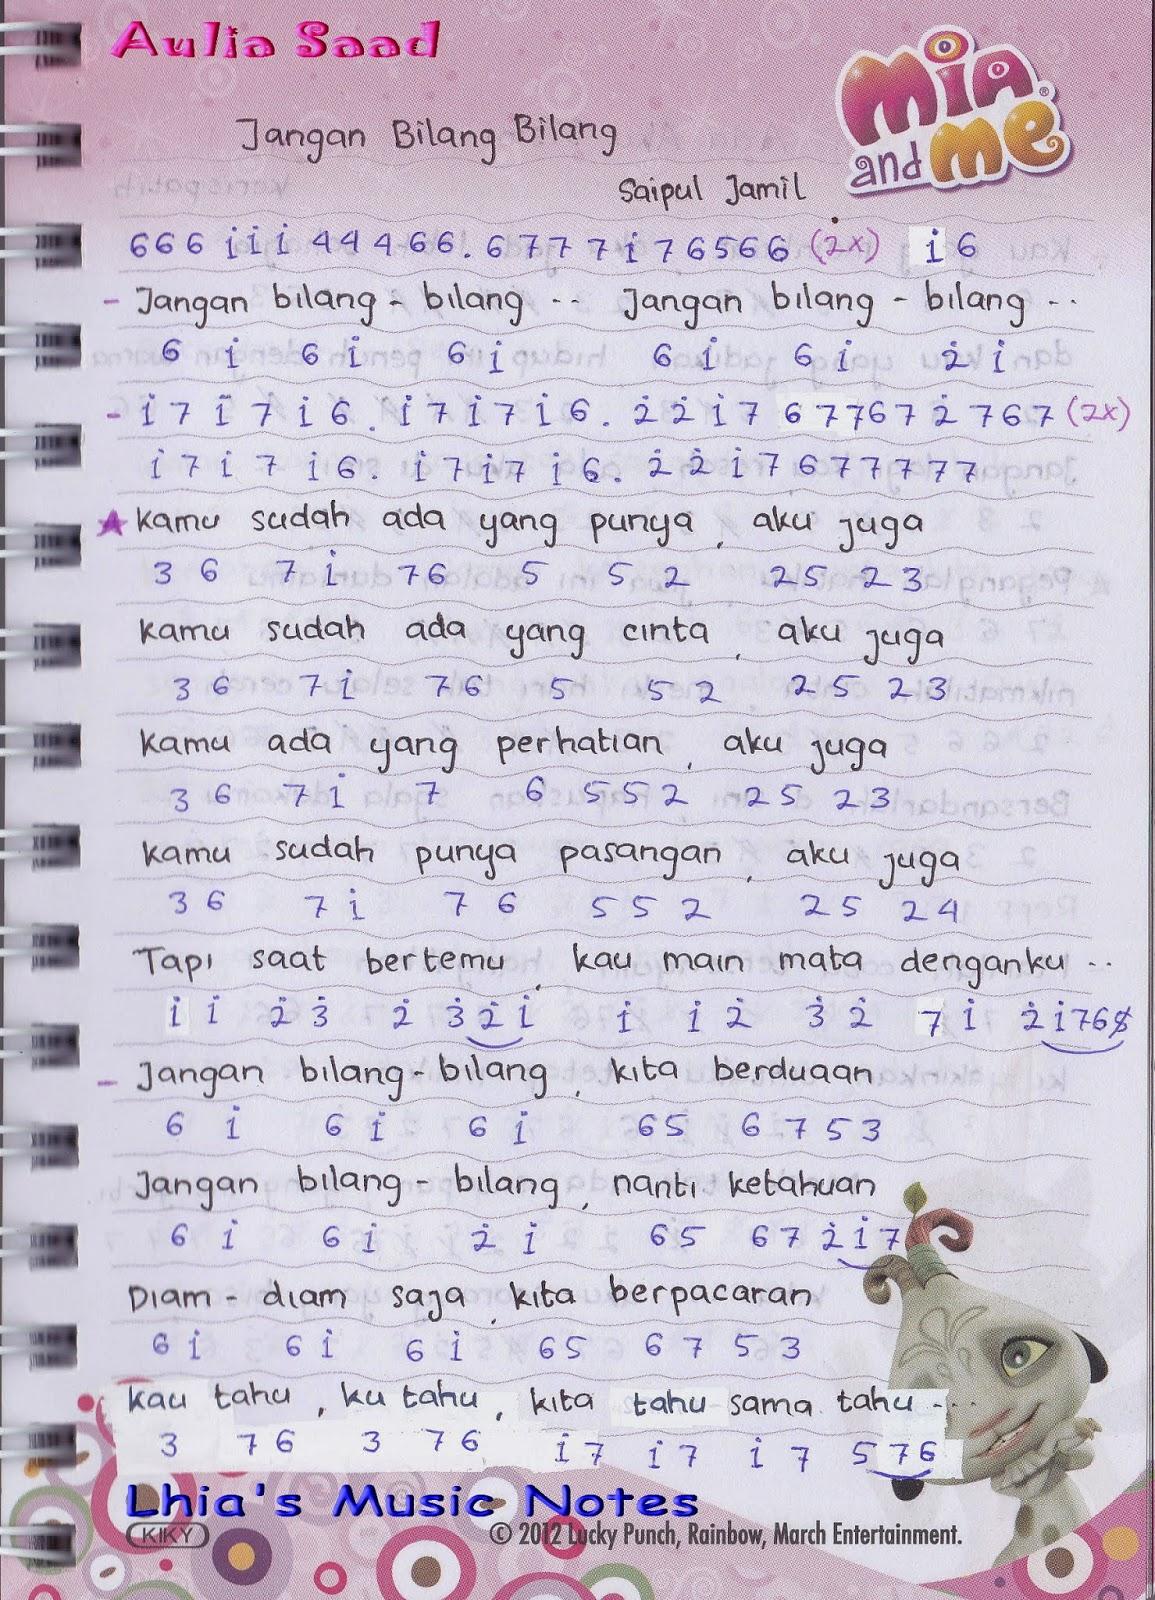 Not Pianika Pemfula Saipul Jamil Jangan Bilang Bilang Lhia S Music Notes